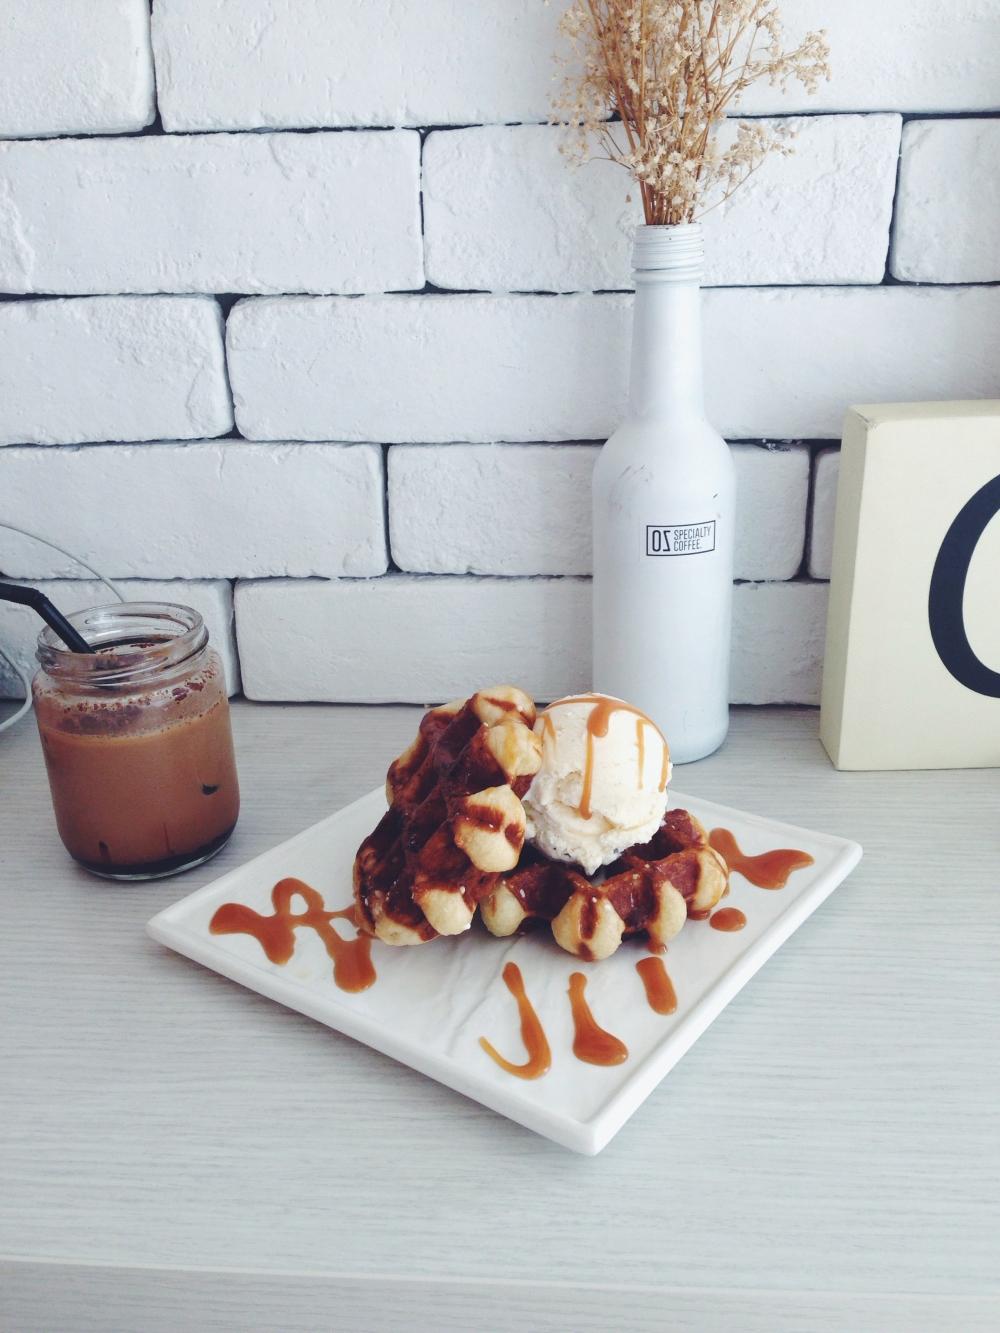 Salted caramel belgian Liege waffles– $7.50